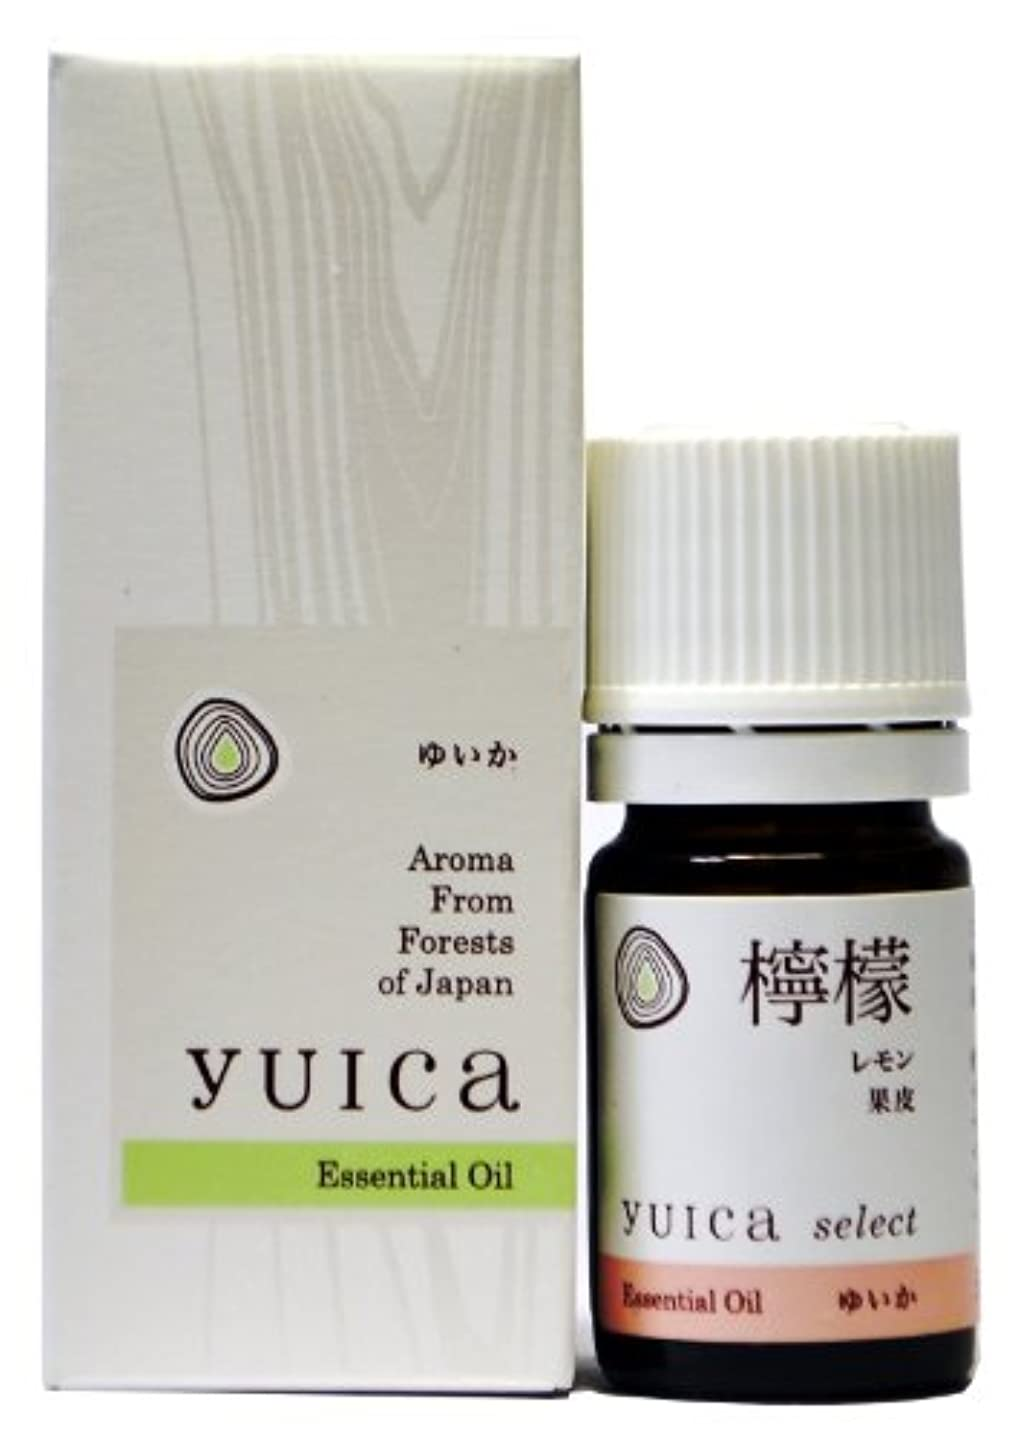 yuica select エッセンシャルオイル レモン(果皮部) 5mL